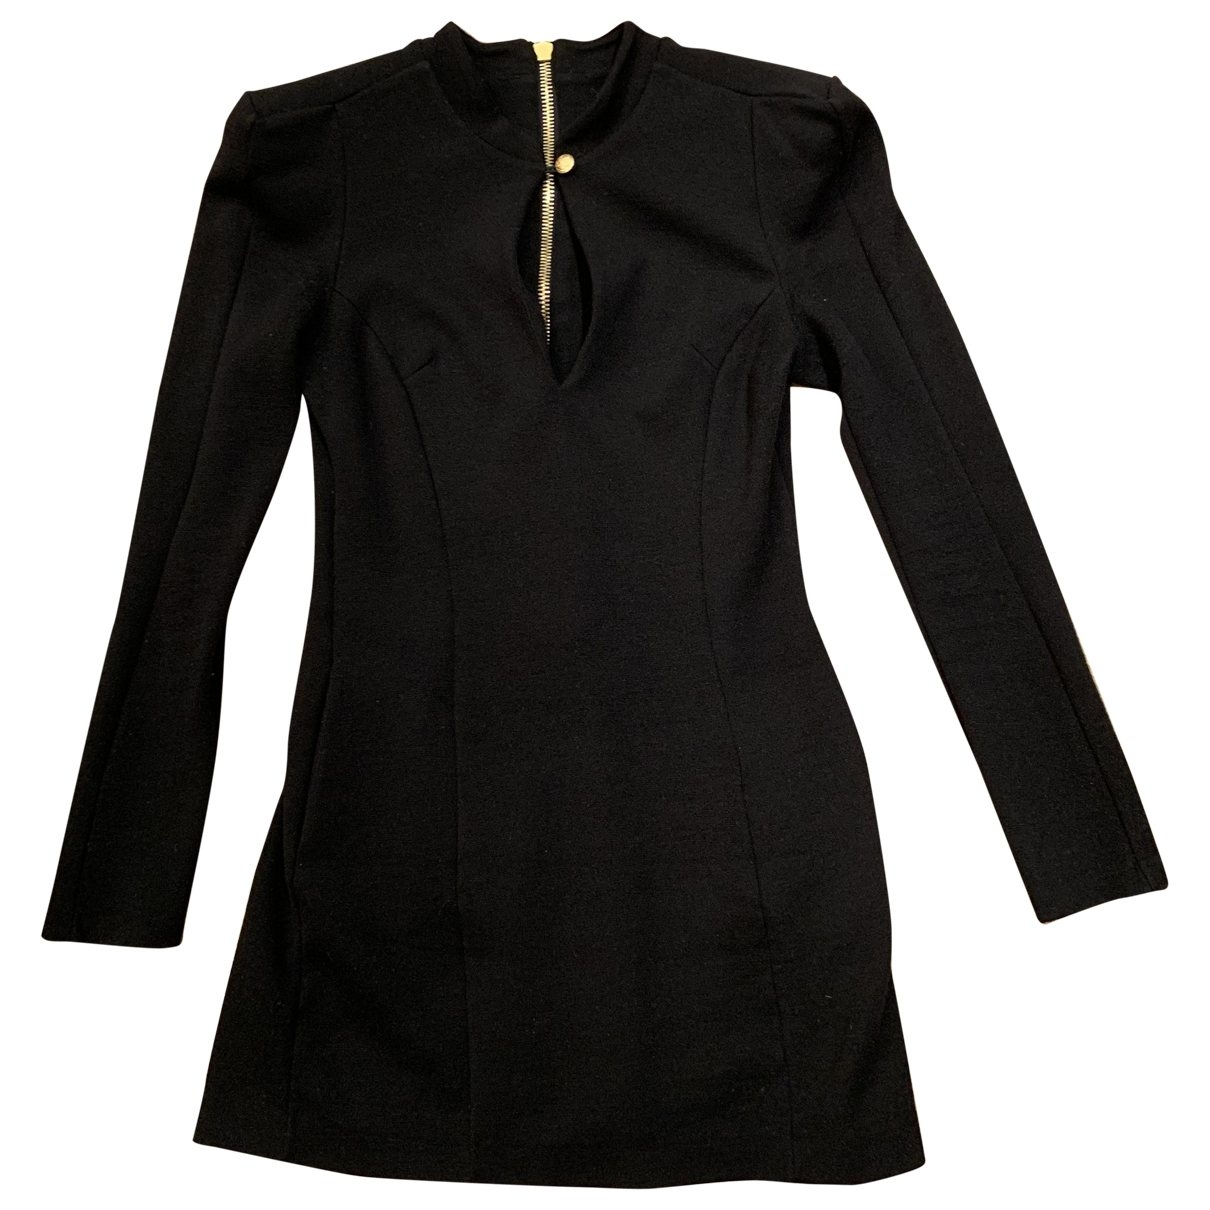 Balmain \N Black Wool dress for Women 36 FR